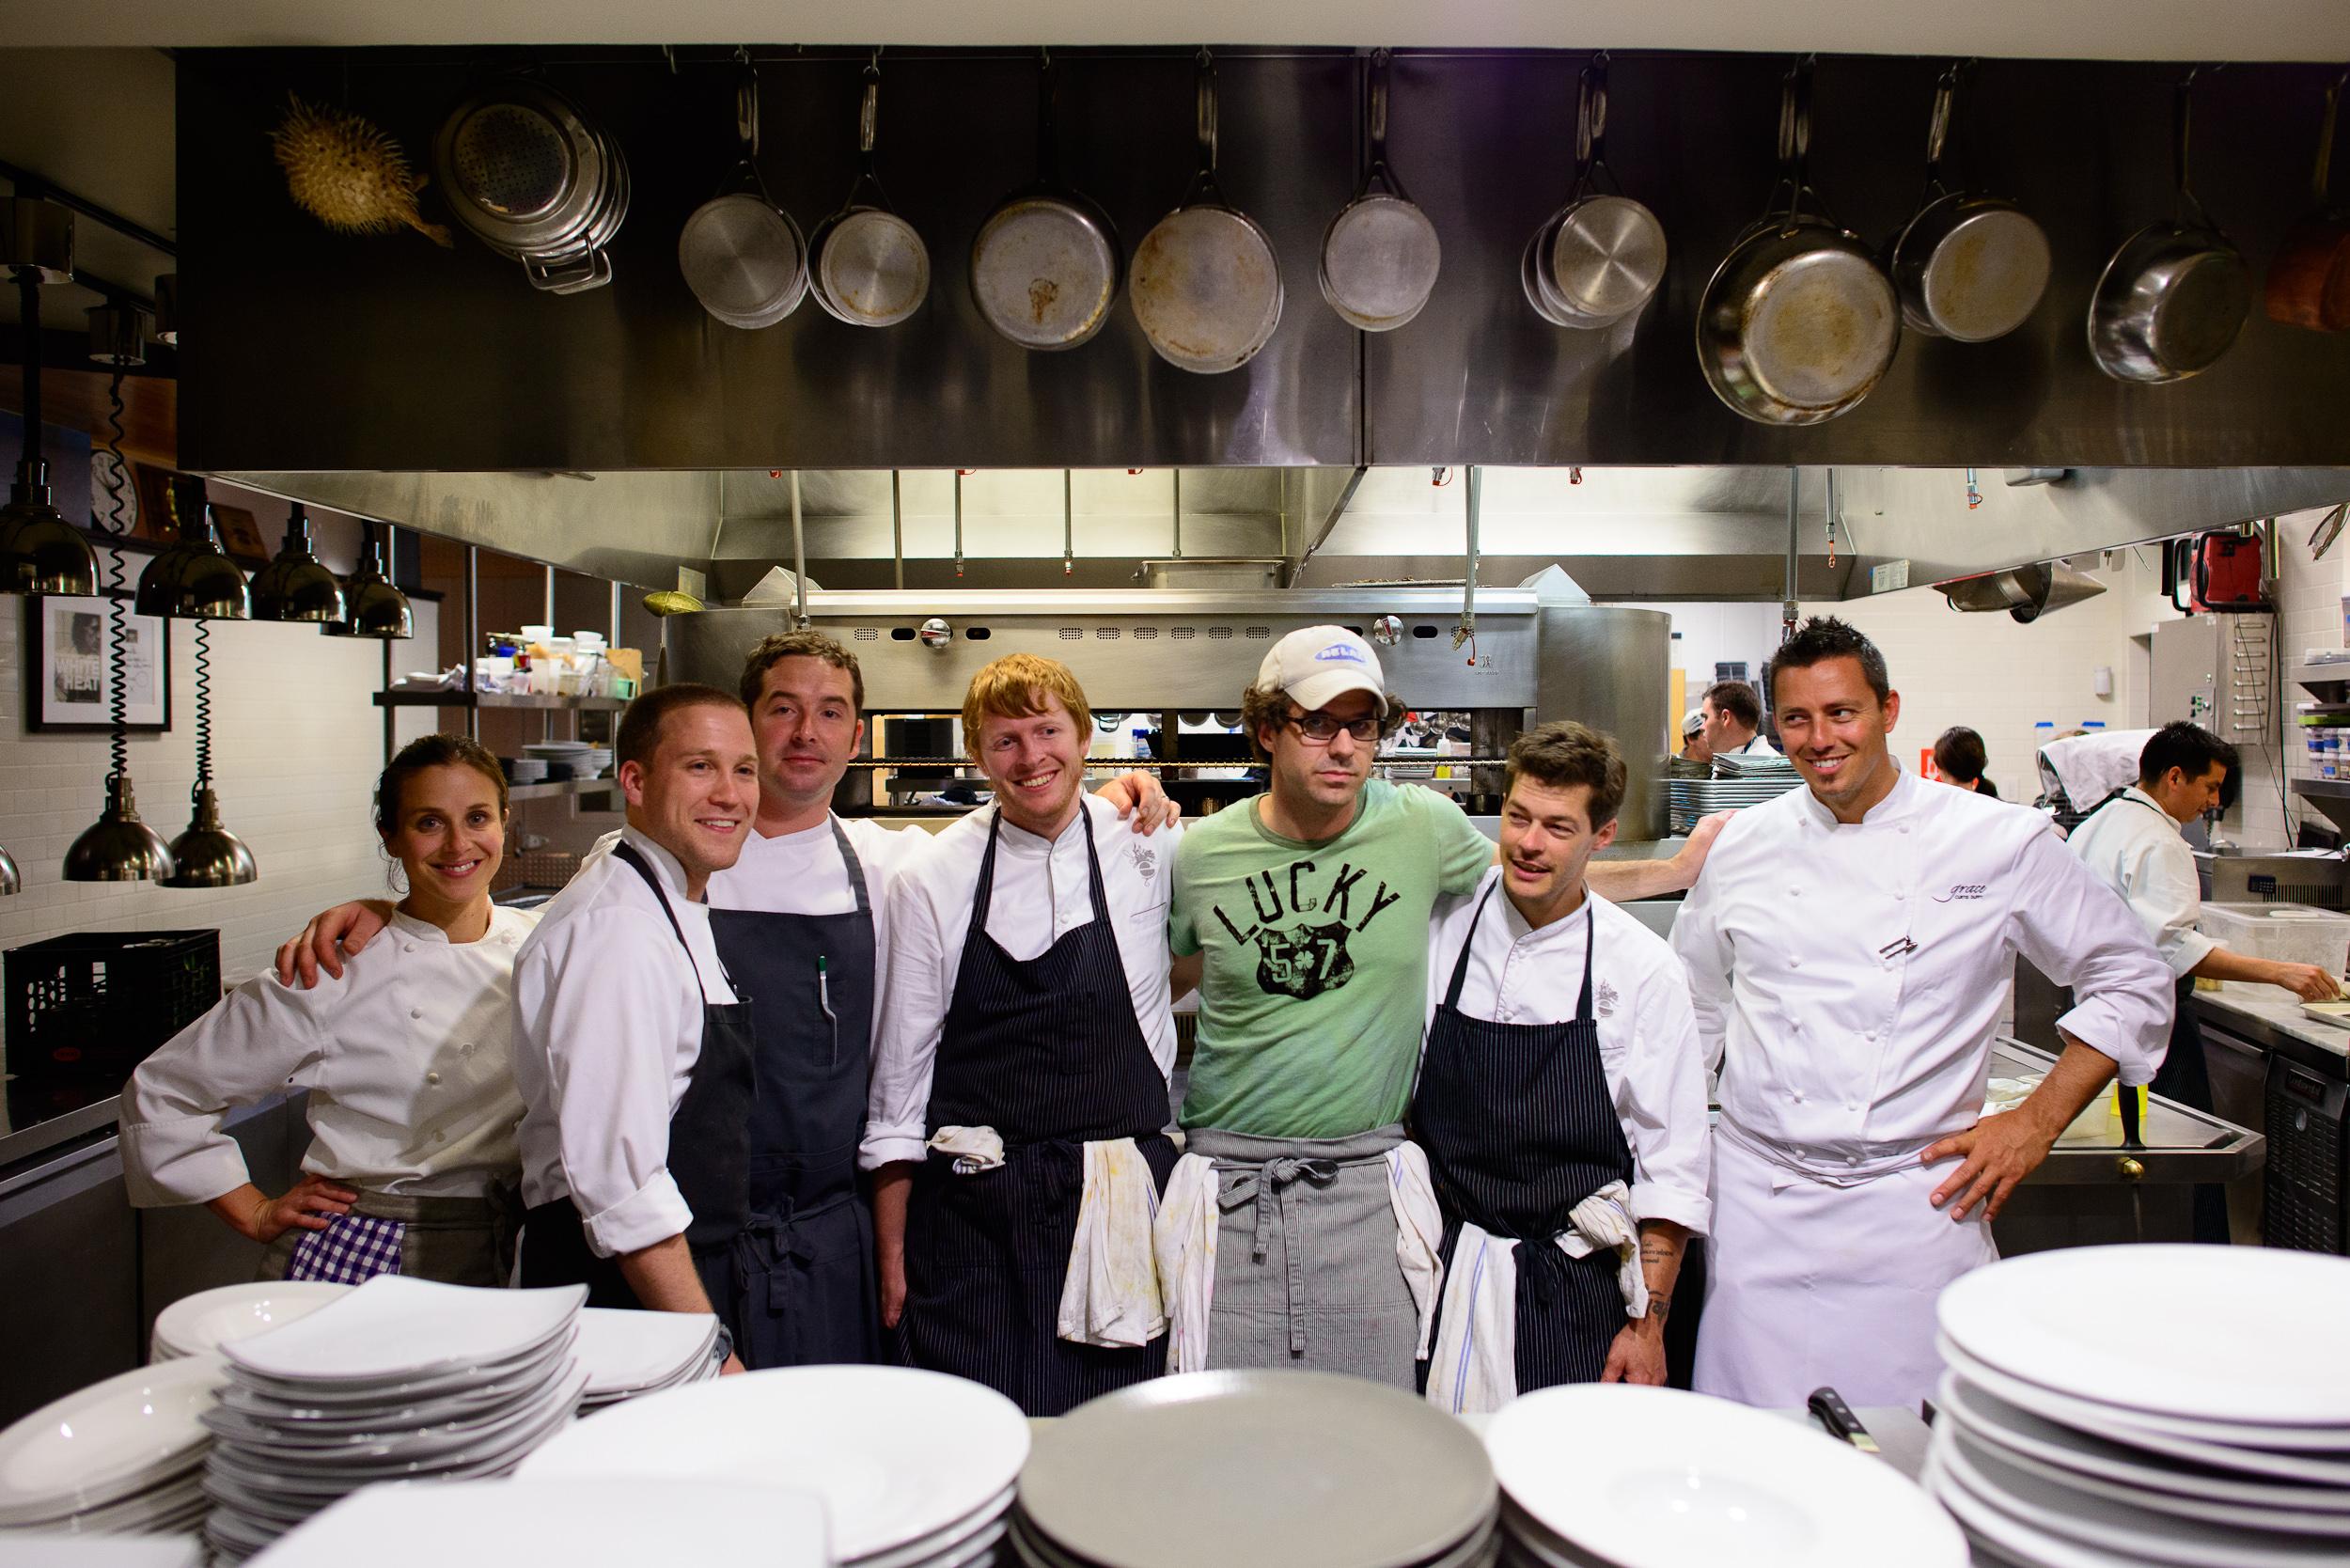 Chefs Karen and John Shields, Johnny Spero, Michael Ryan, Alex T